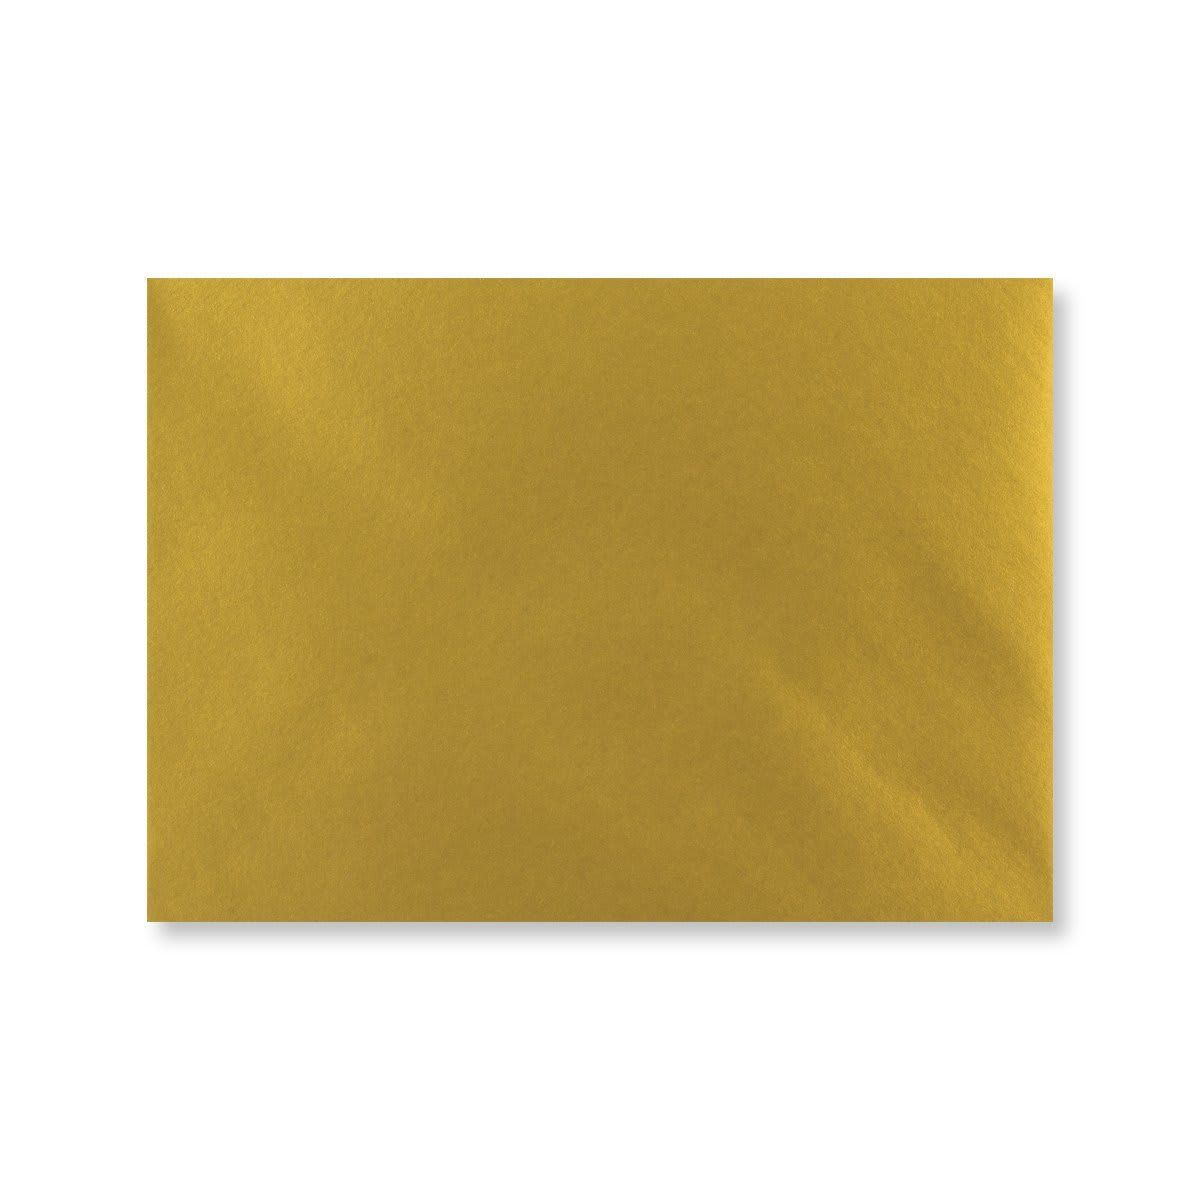 C6 METALLIC GOLD ENVELOPES (NEW SHADE)